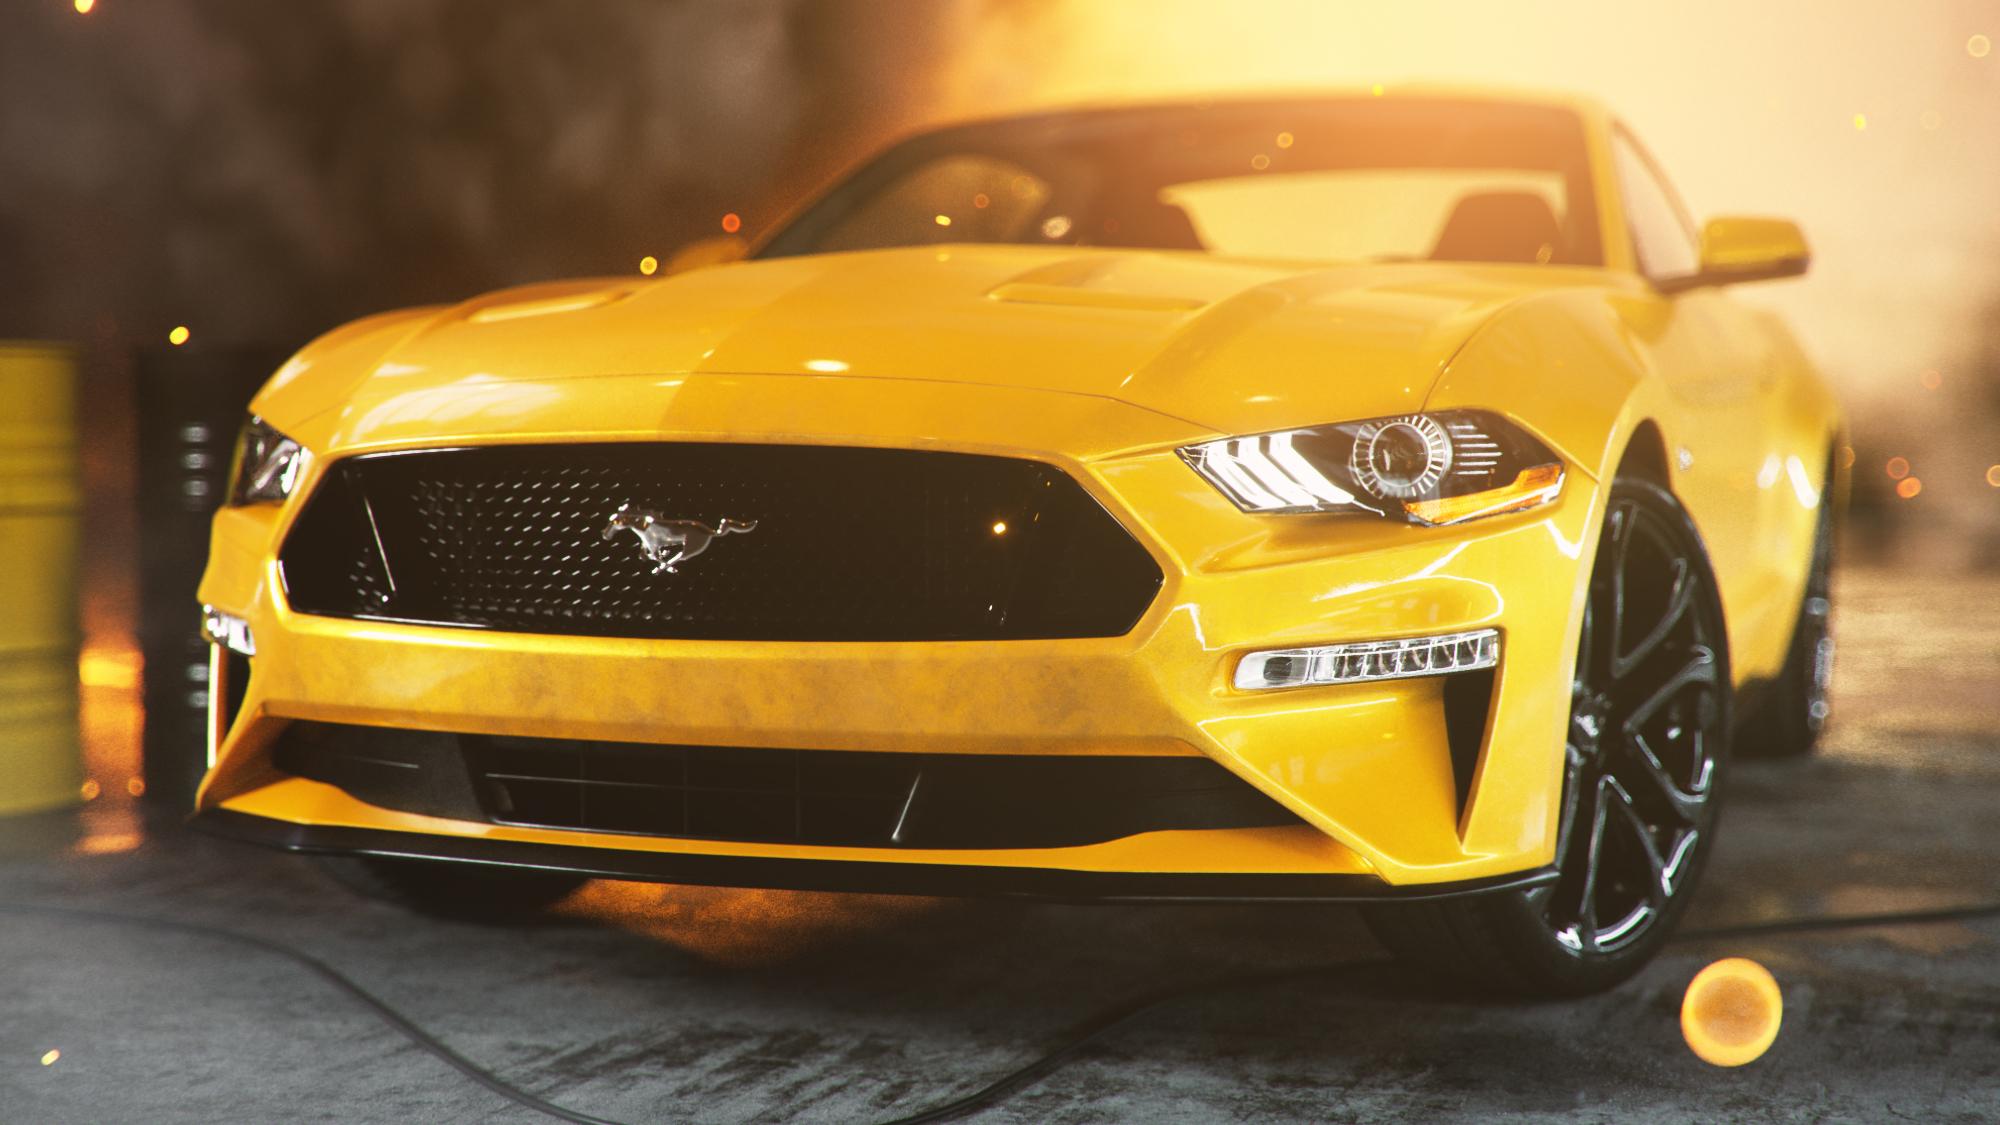 Ford Mustang Wallpaper | HD Car Wallpapers | ID #10785